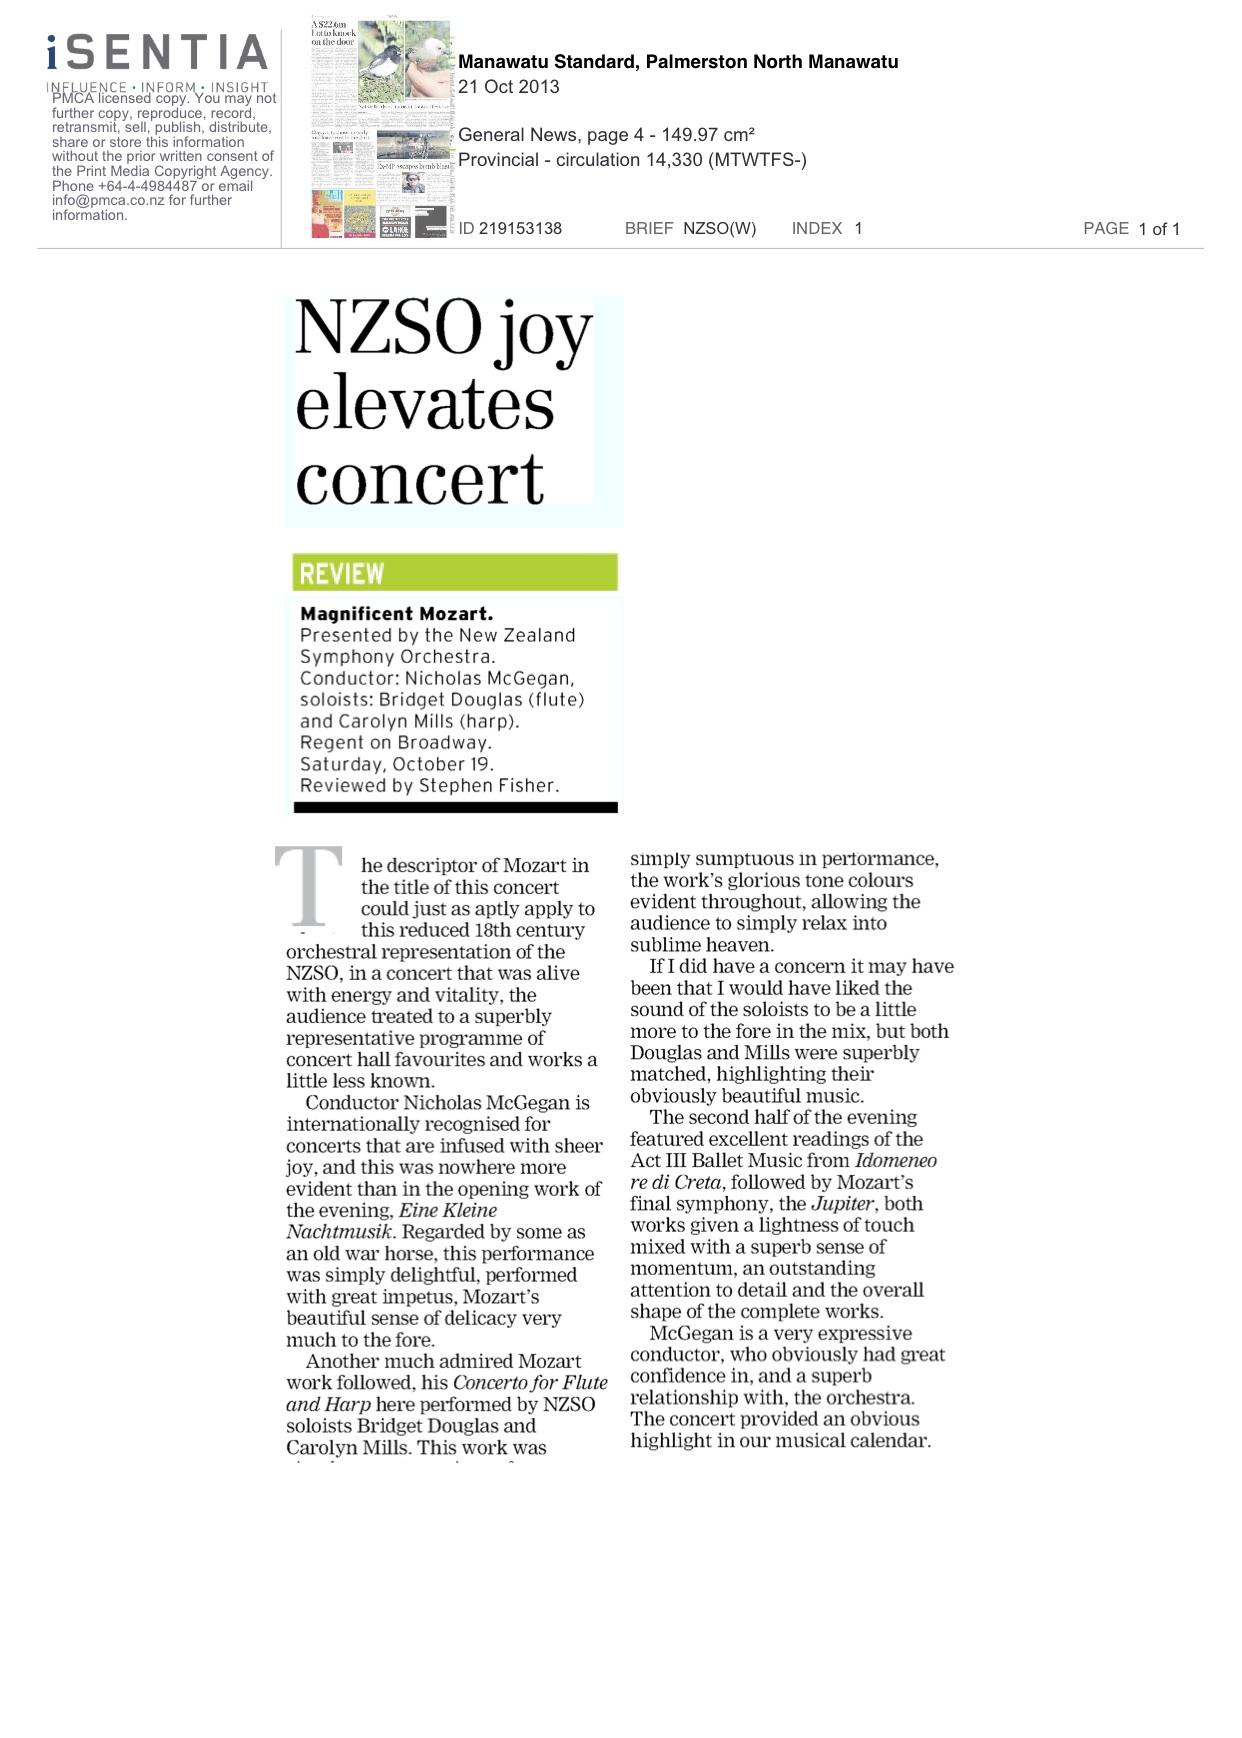 Manawatu-Standard-Palmerston-North.MagMozart.Review.21.10.13